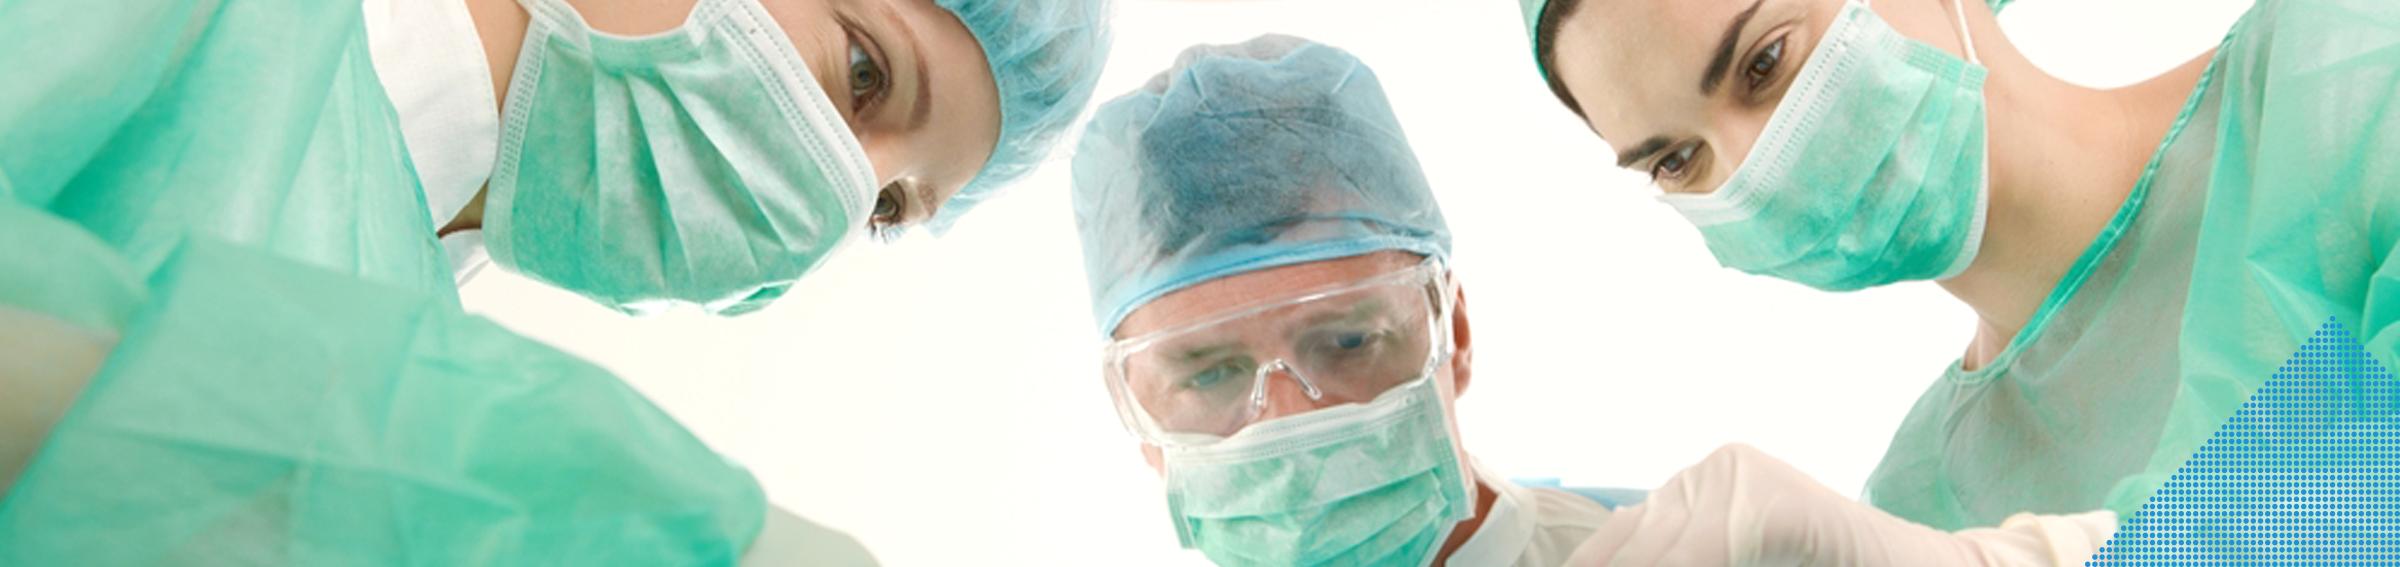 Healthcare - Medical fader